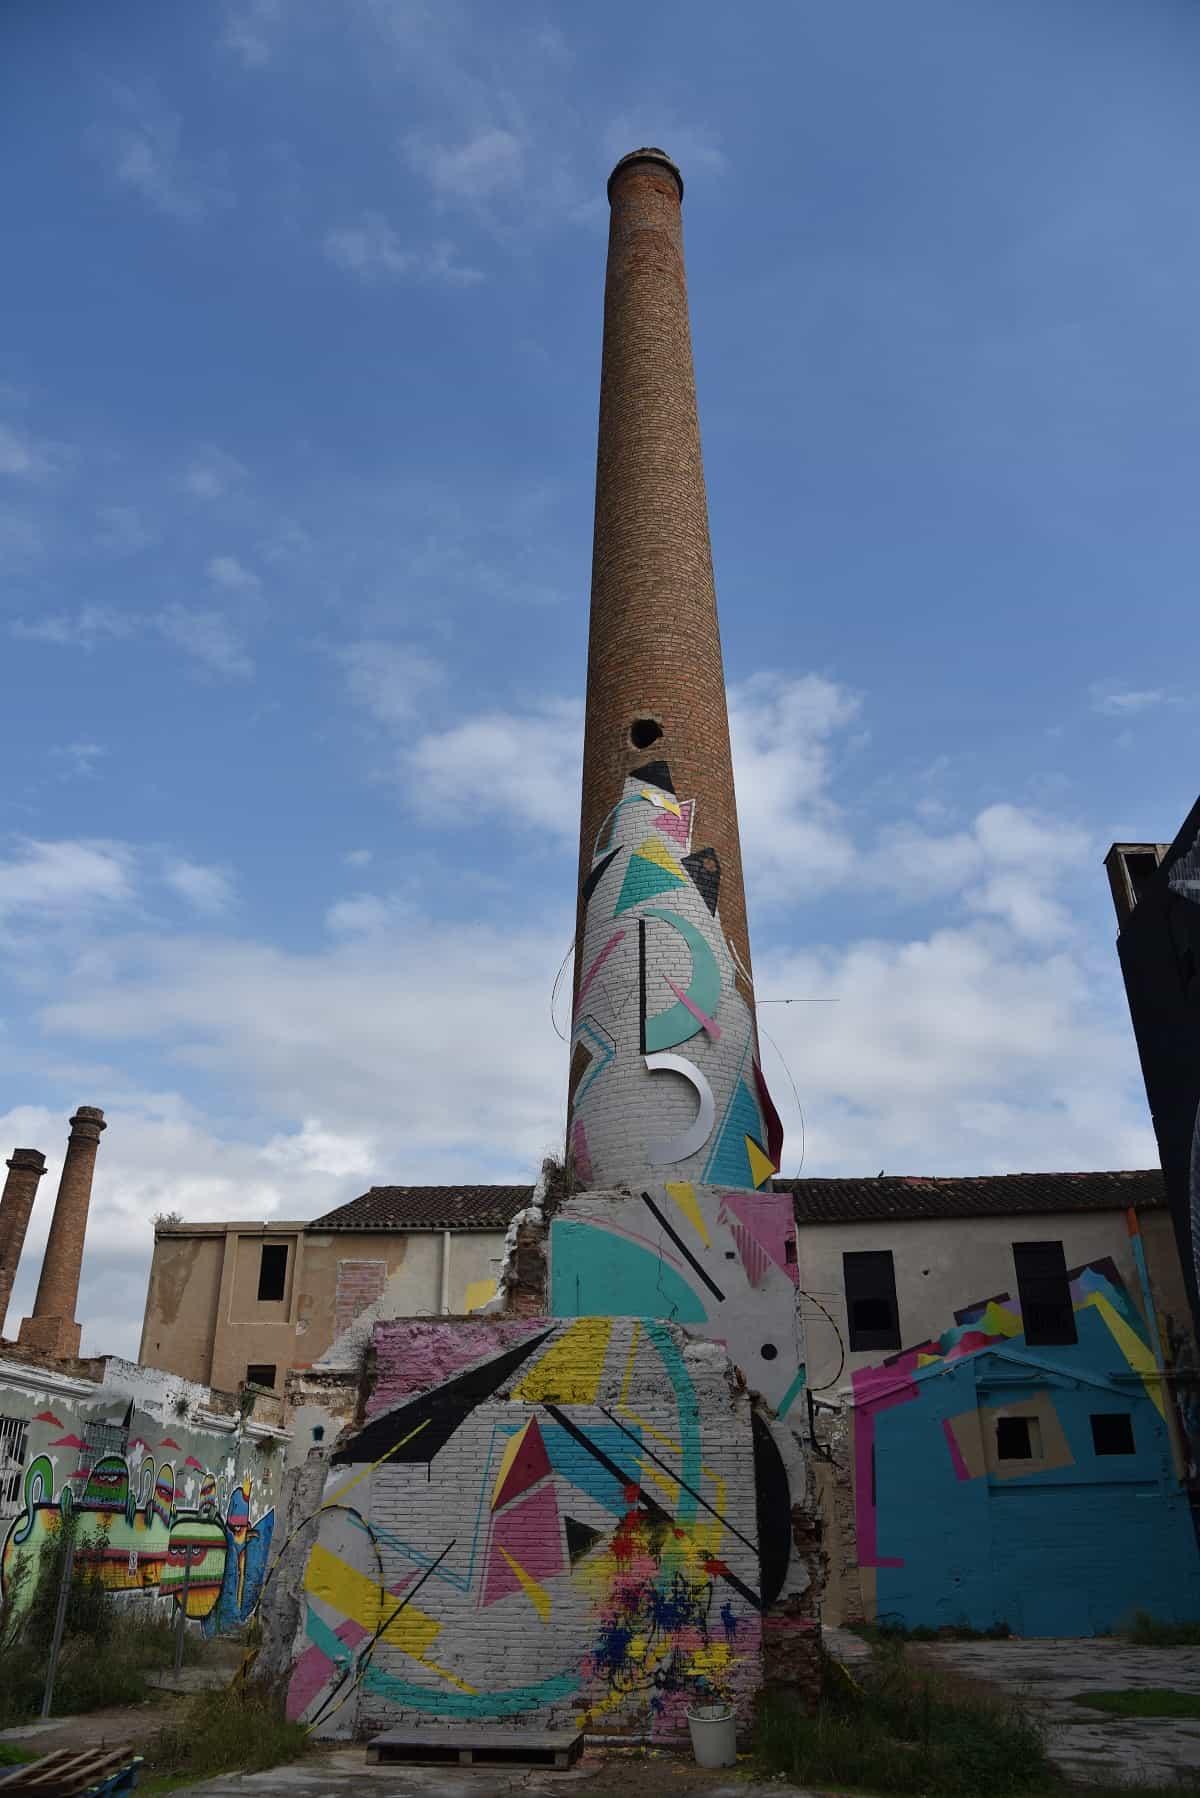 La Escocesa Chimney, Barcelona